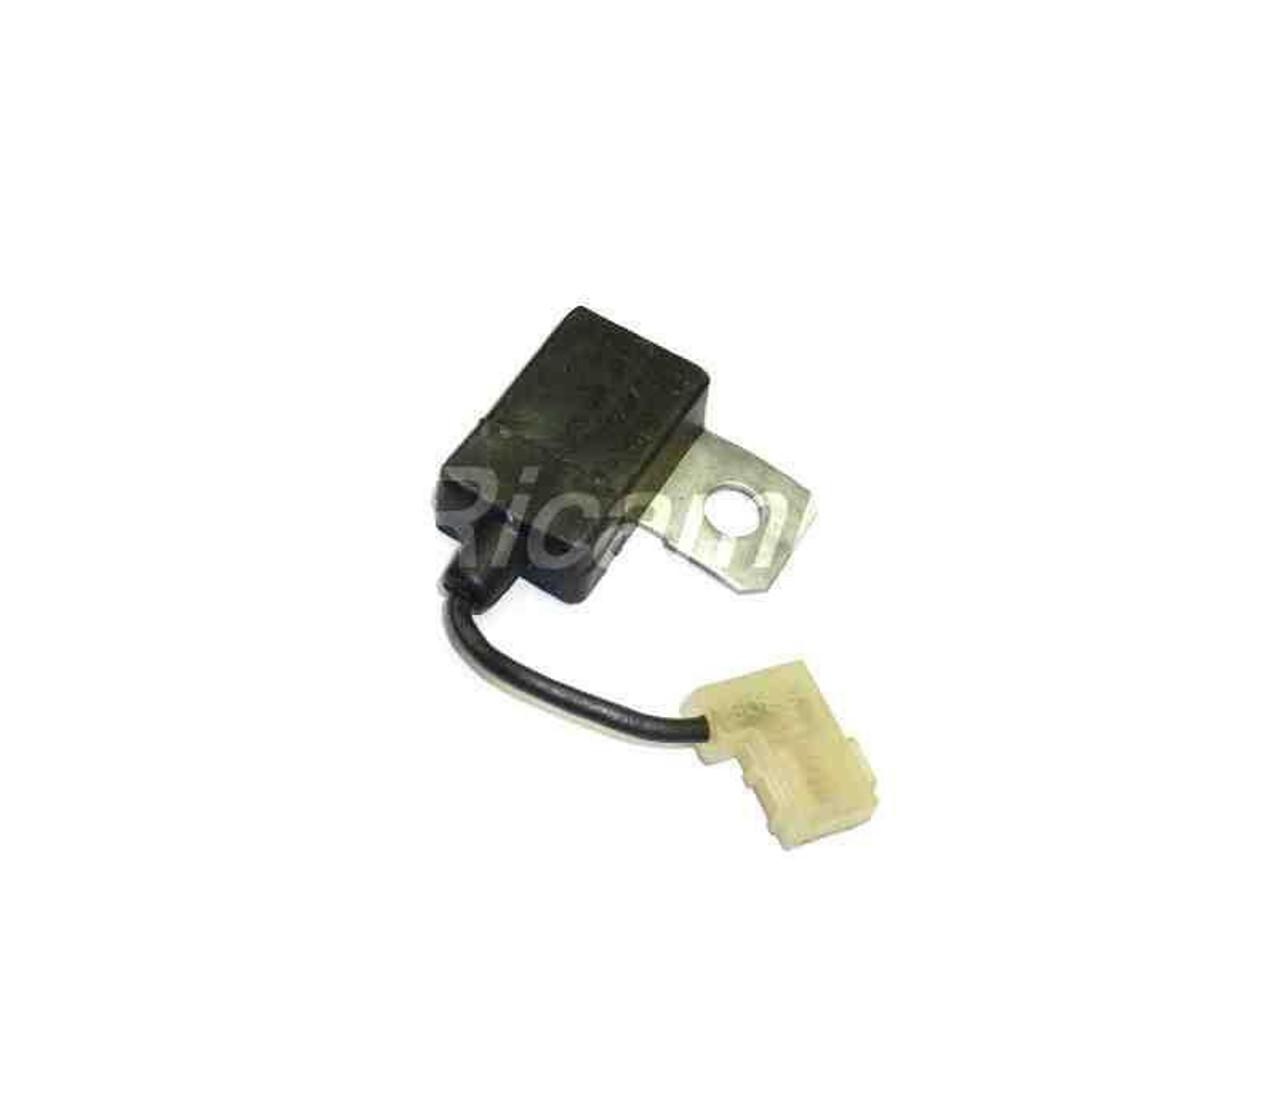 Condenser for Bosch Alternators